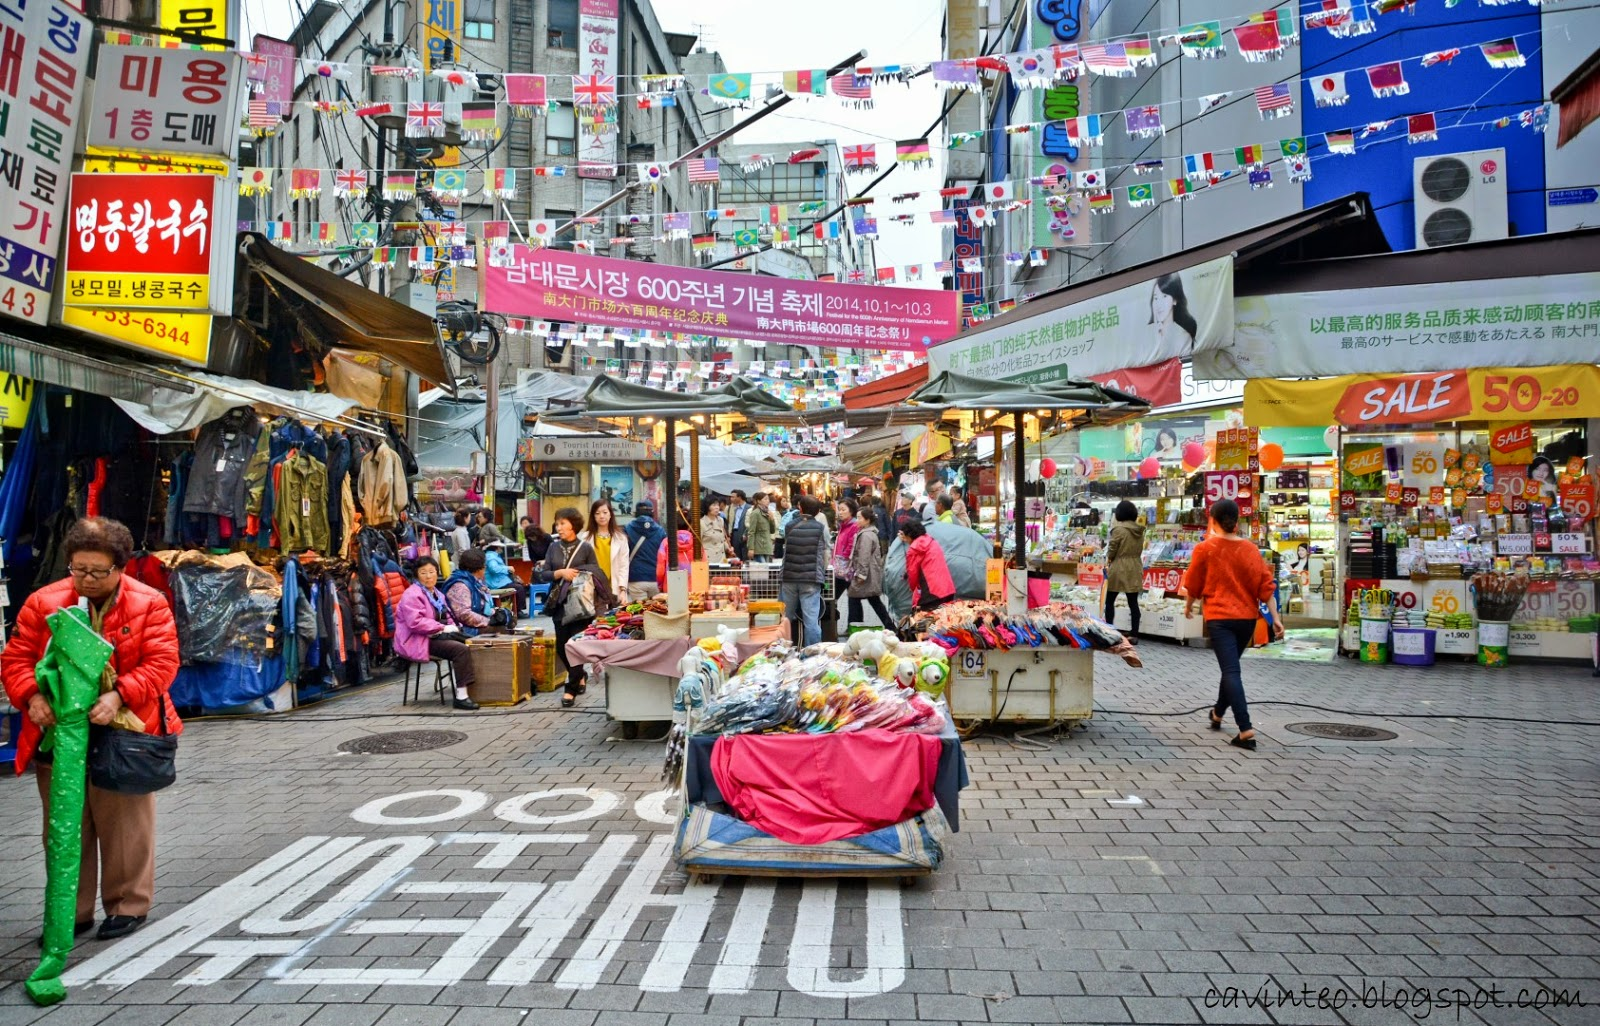 10 Best Hotels Near Myeong-dong Station - TripAdvisor